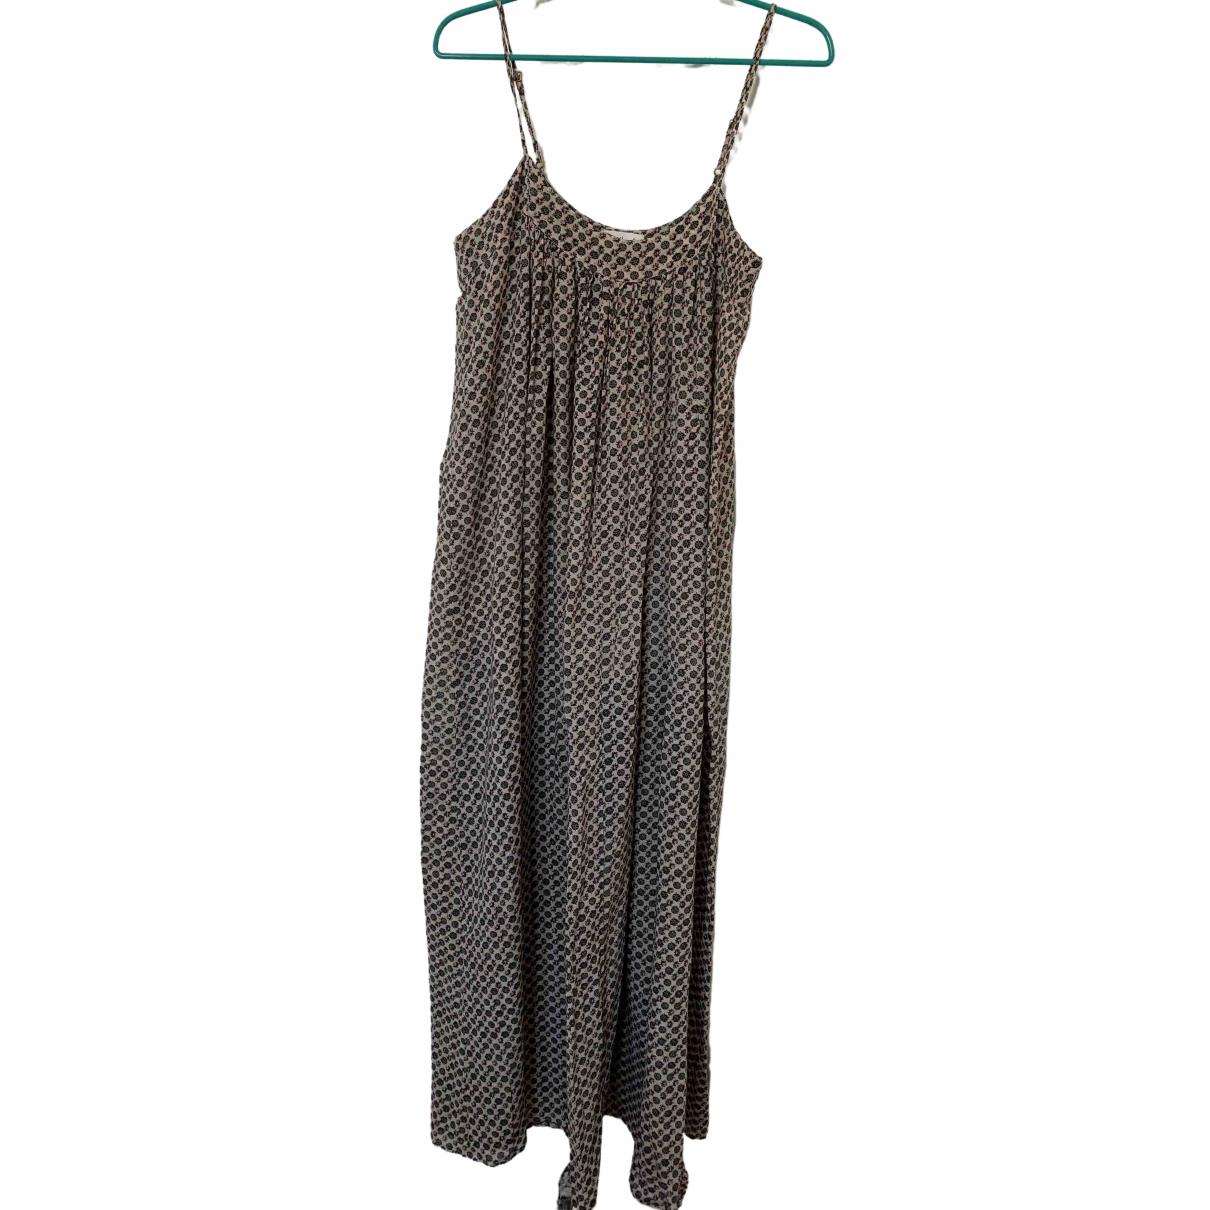 Swildens \N Multicolour Cotton dress for Women One Size FR